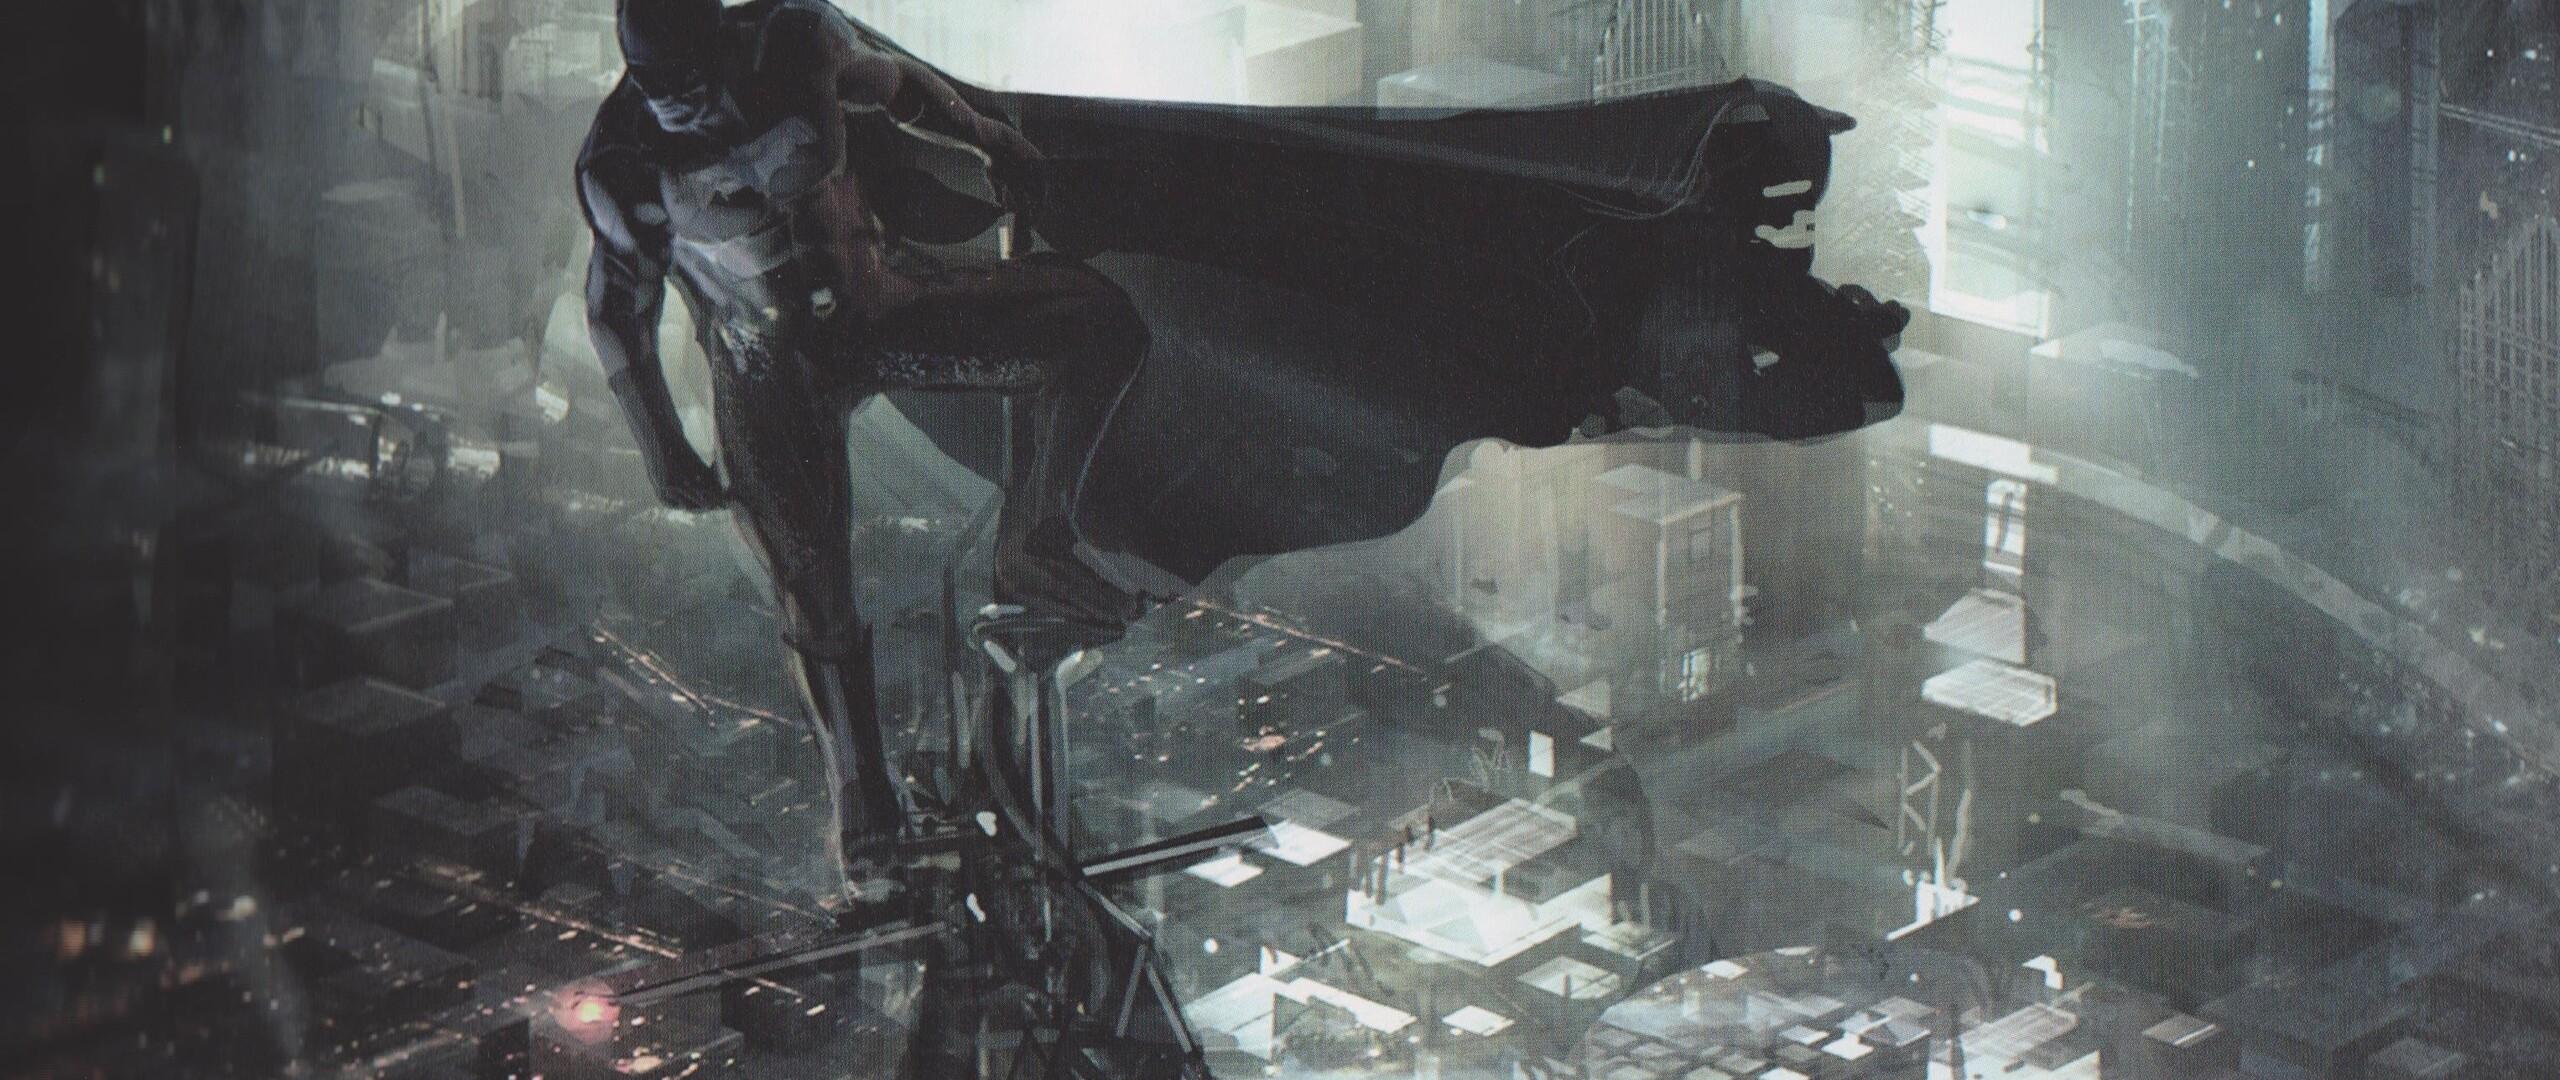 batman-justice-league-artwork-4k-eb.jpg